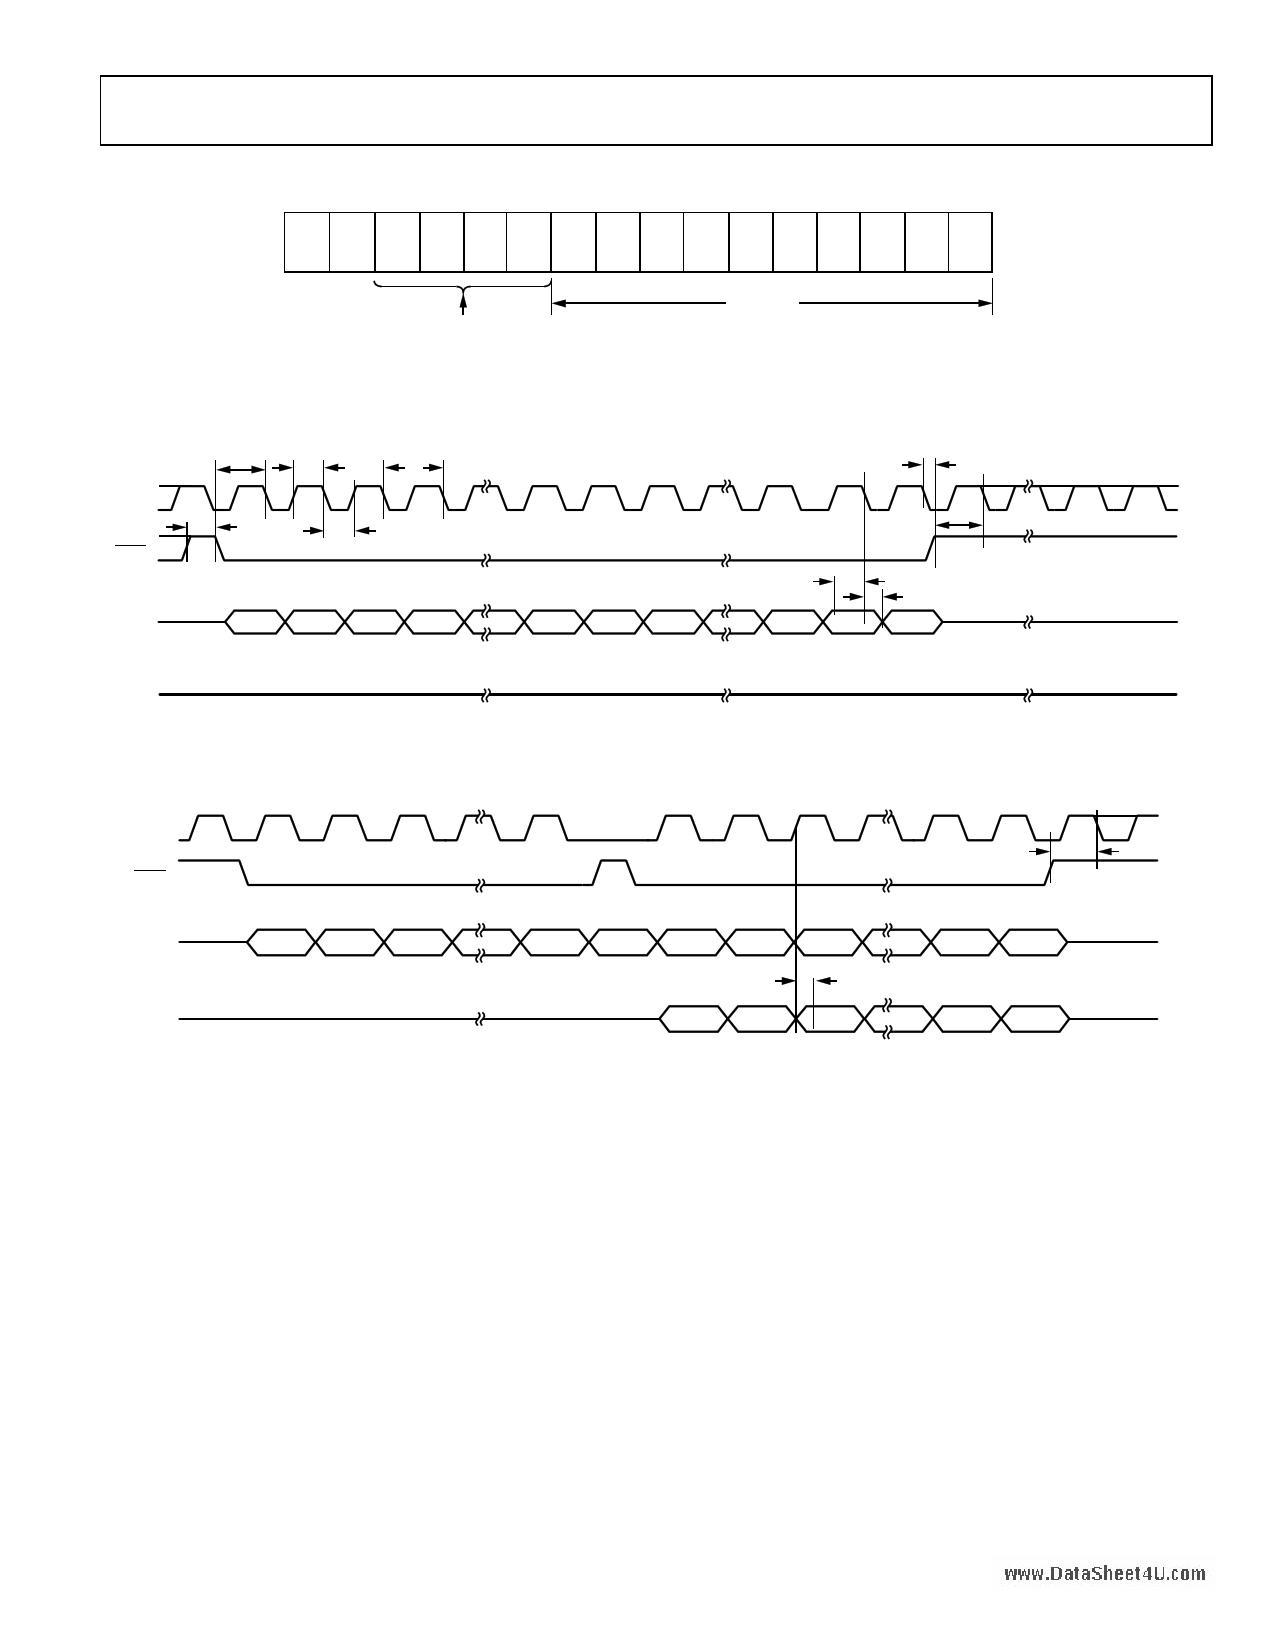 AD5174 pdf, arduino